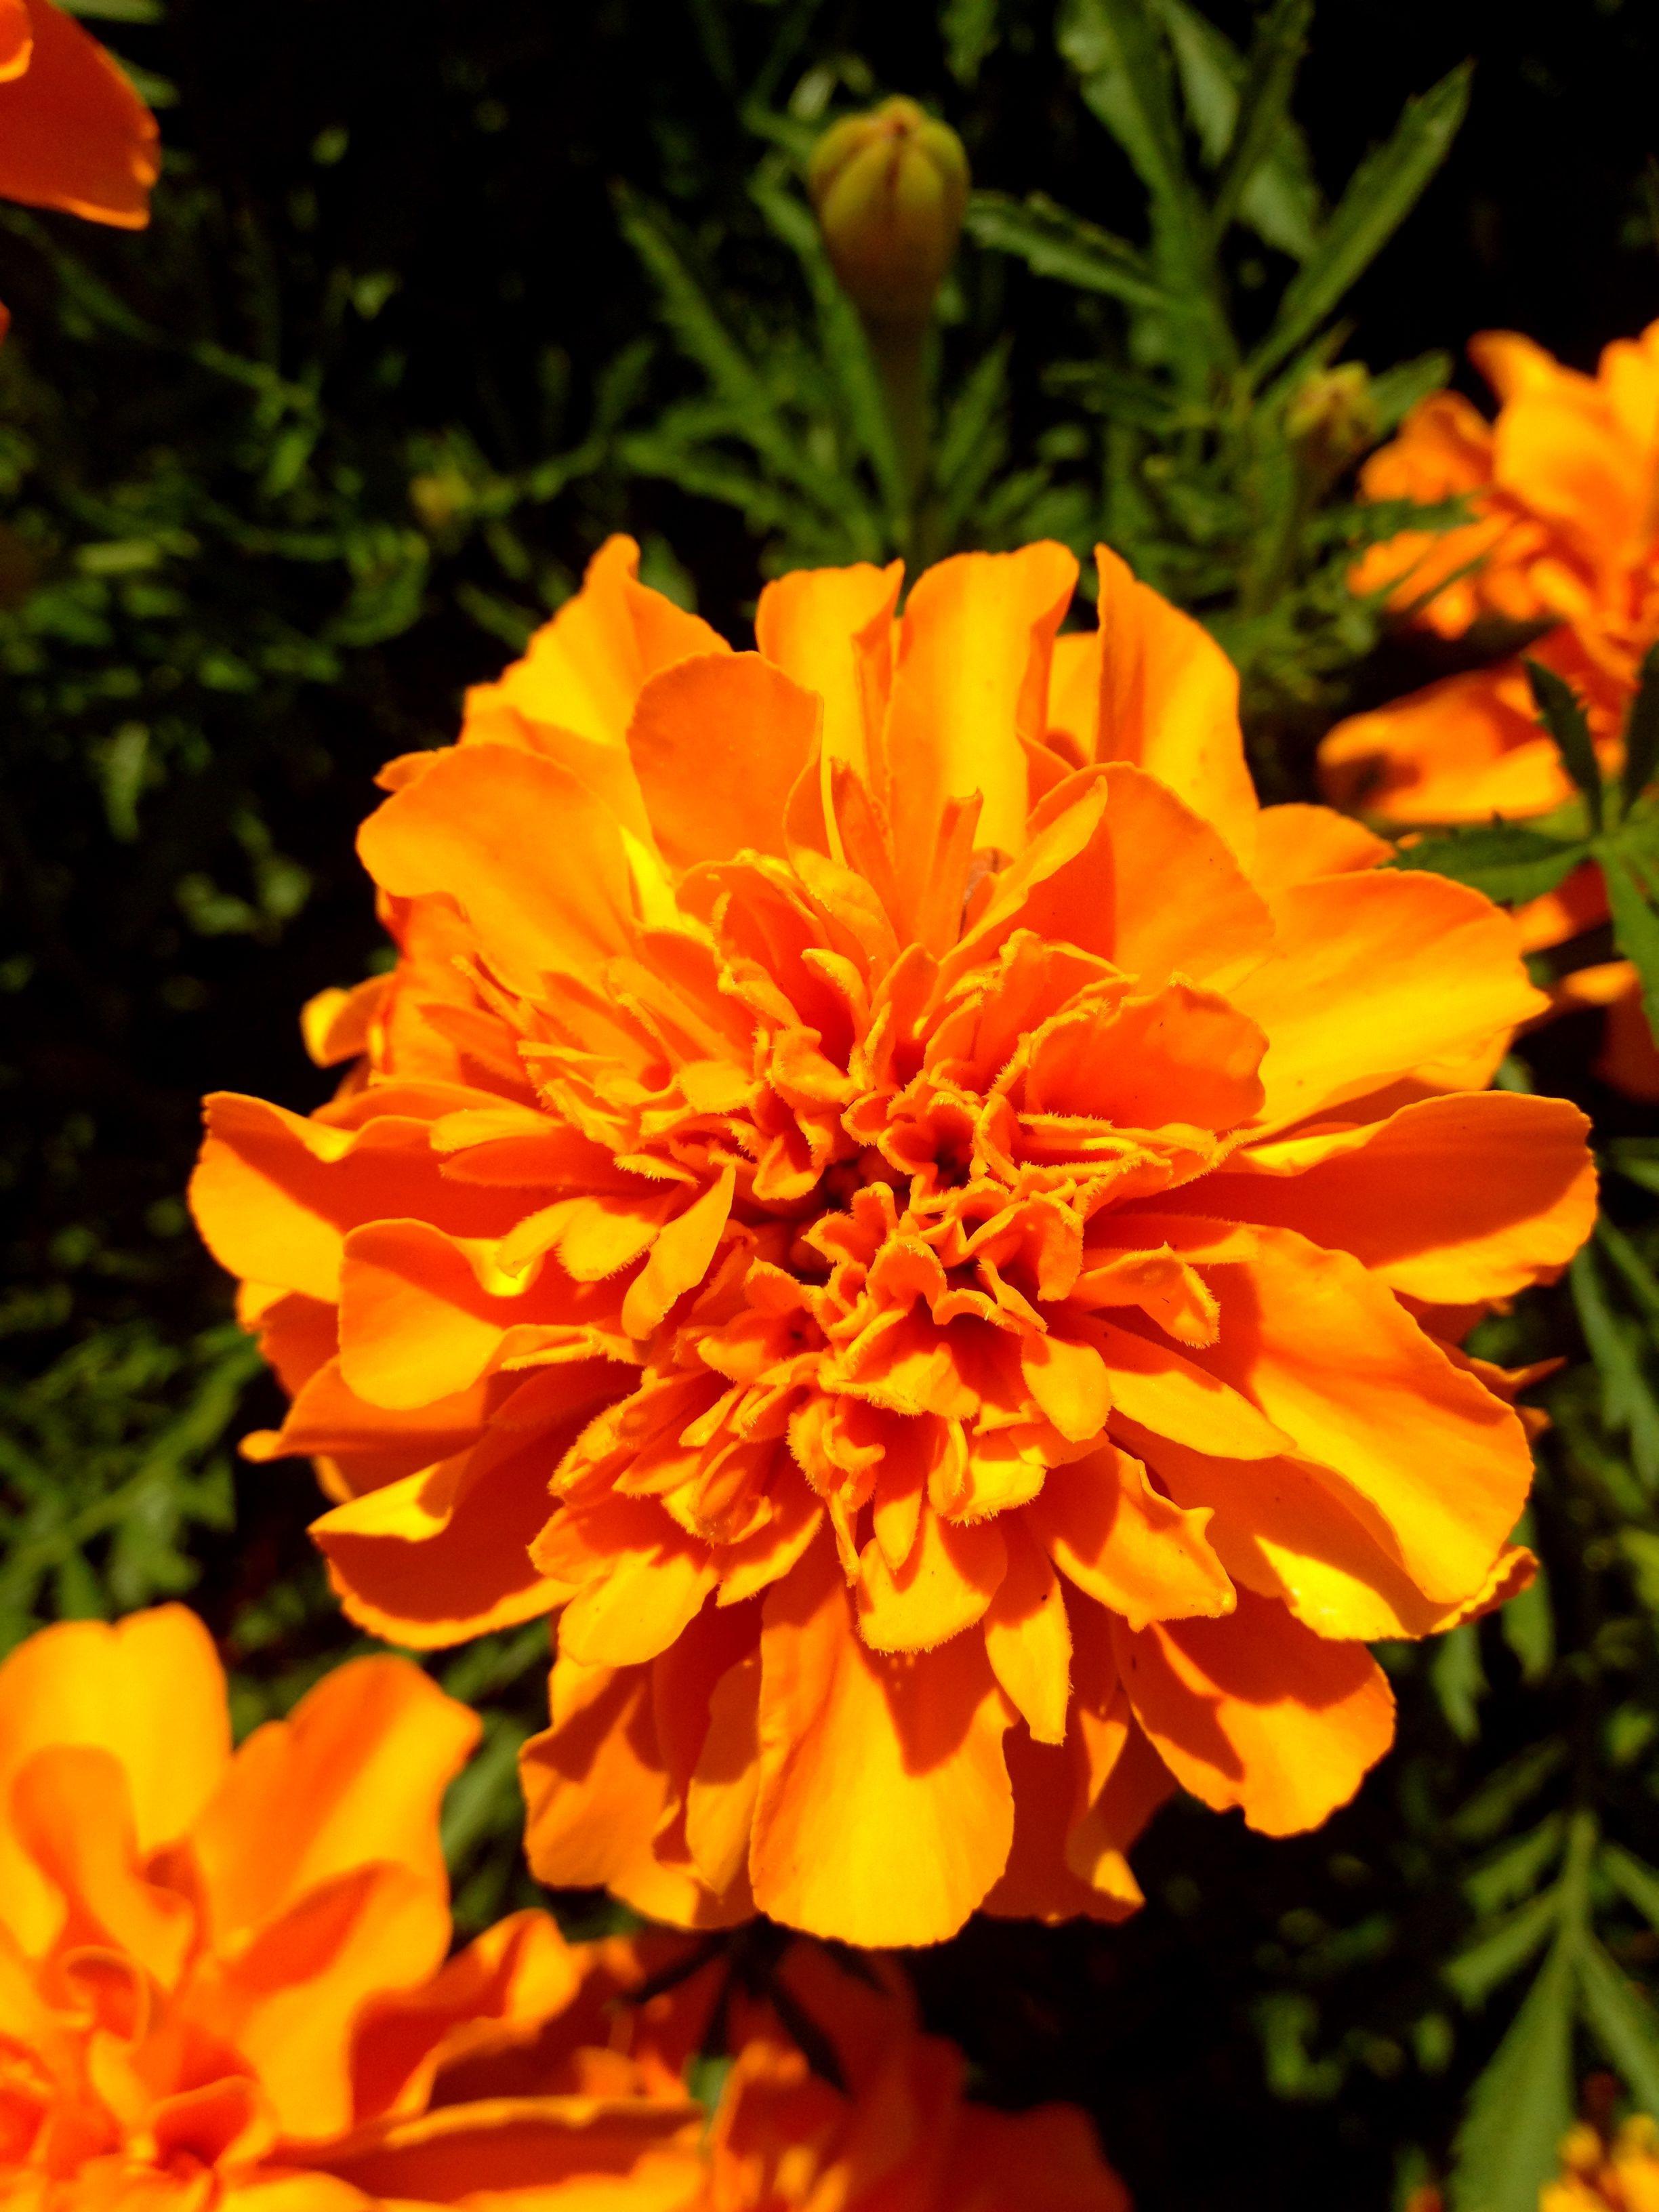 Summer marigolds